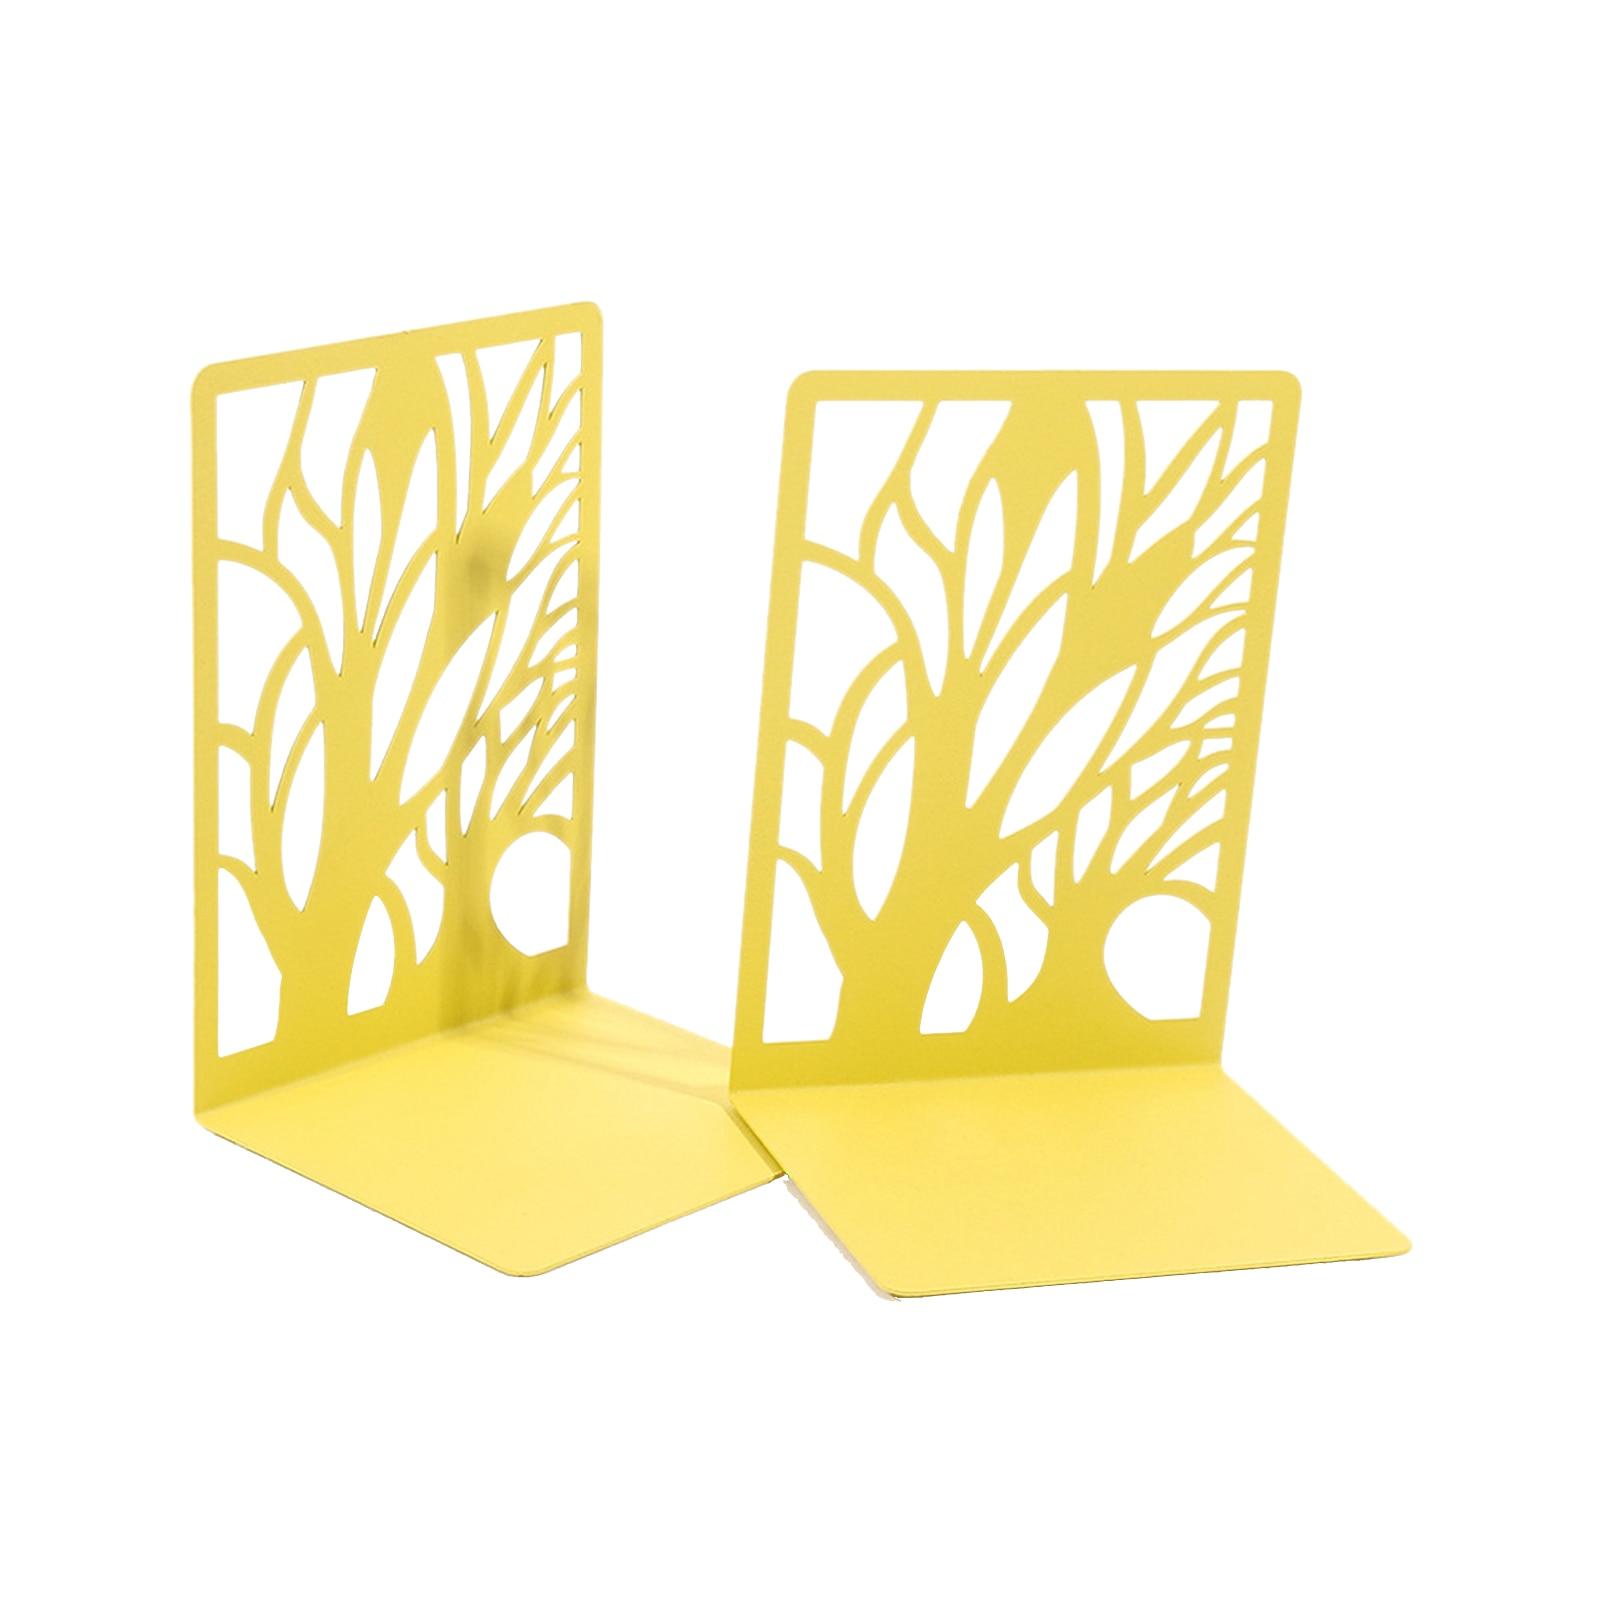 2Pcs Iron Bookends L-shaped Book Holder Desktop Organizer Home Storage Shelf School Stationery Office Accessories